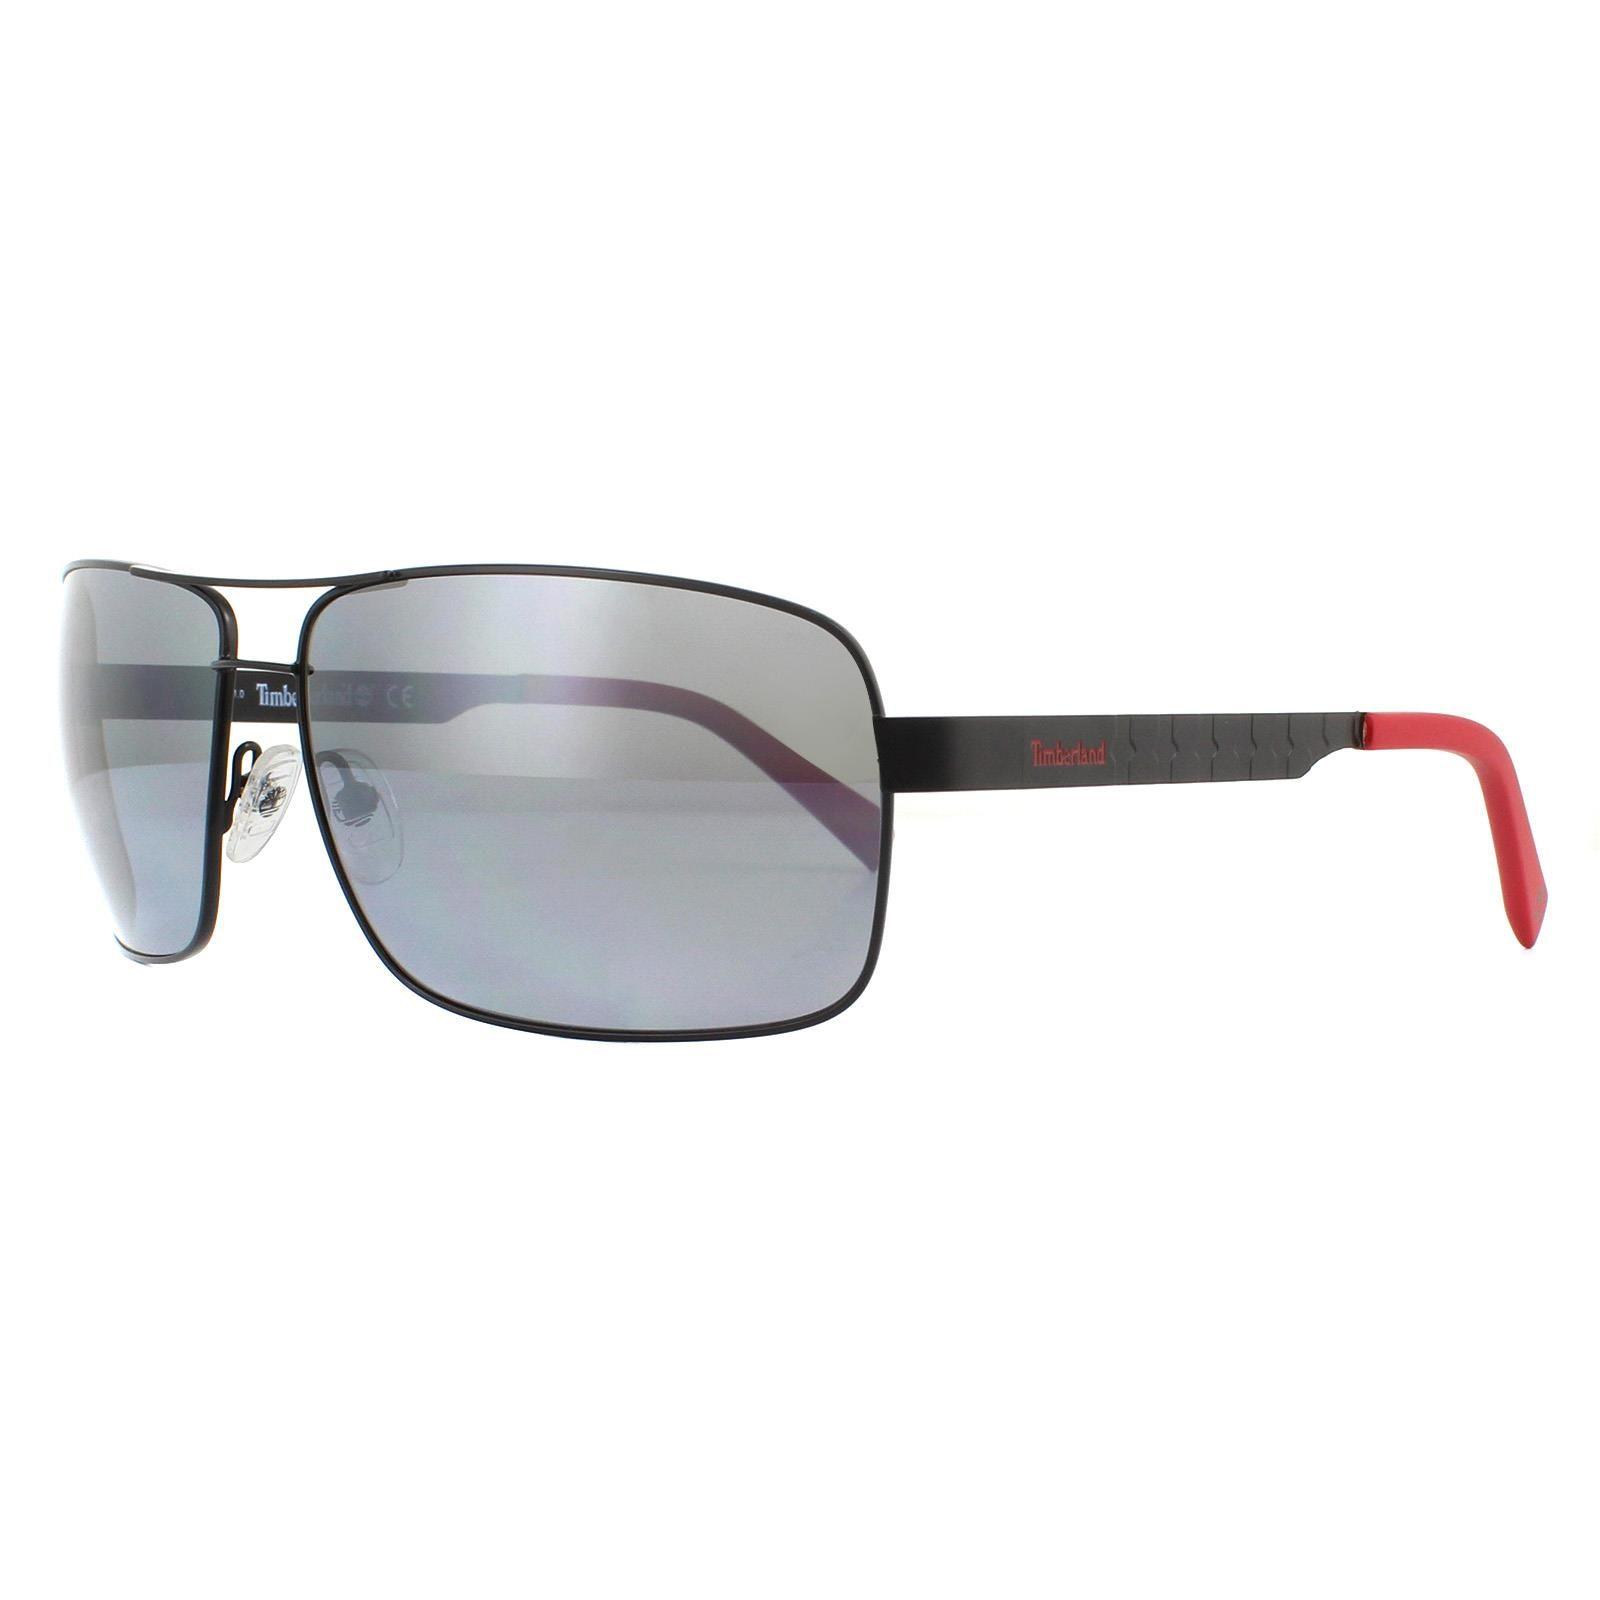 Timberland Sunglasses TB9225 02D Semi Matte Black Grey Polarized